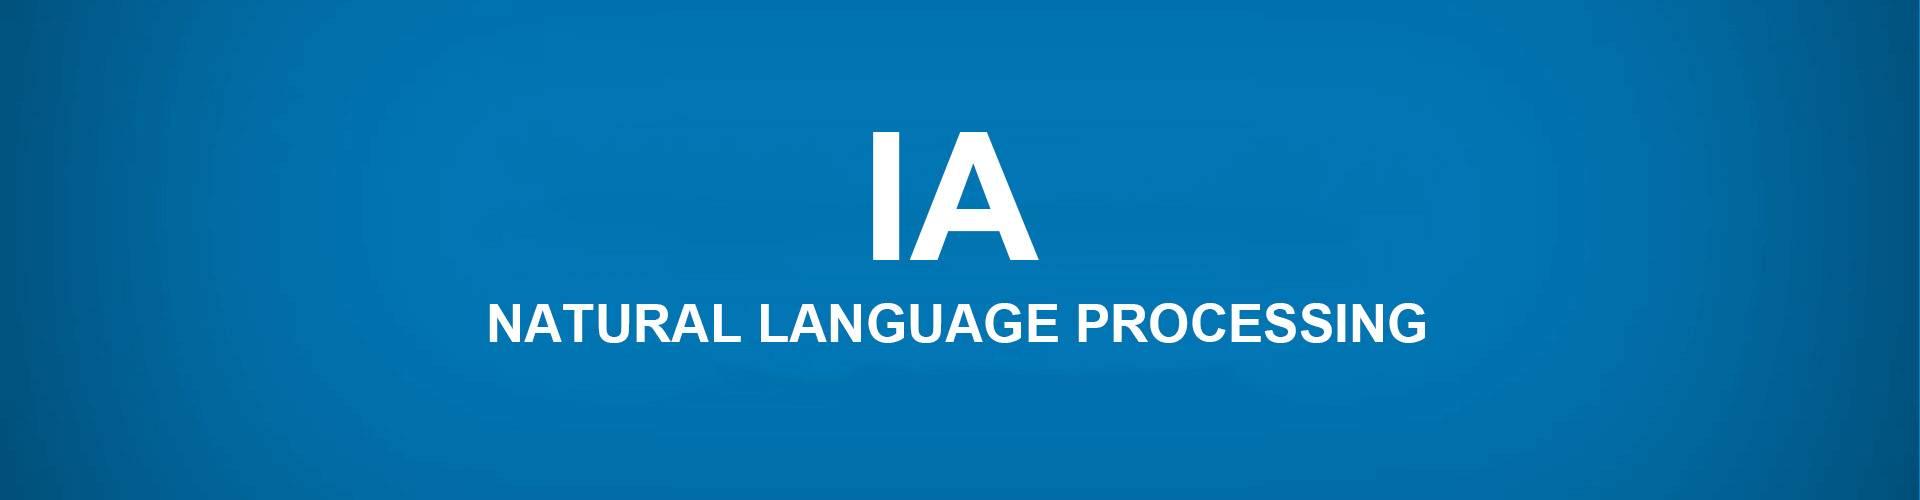 AI NLP Natural Language Processing